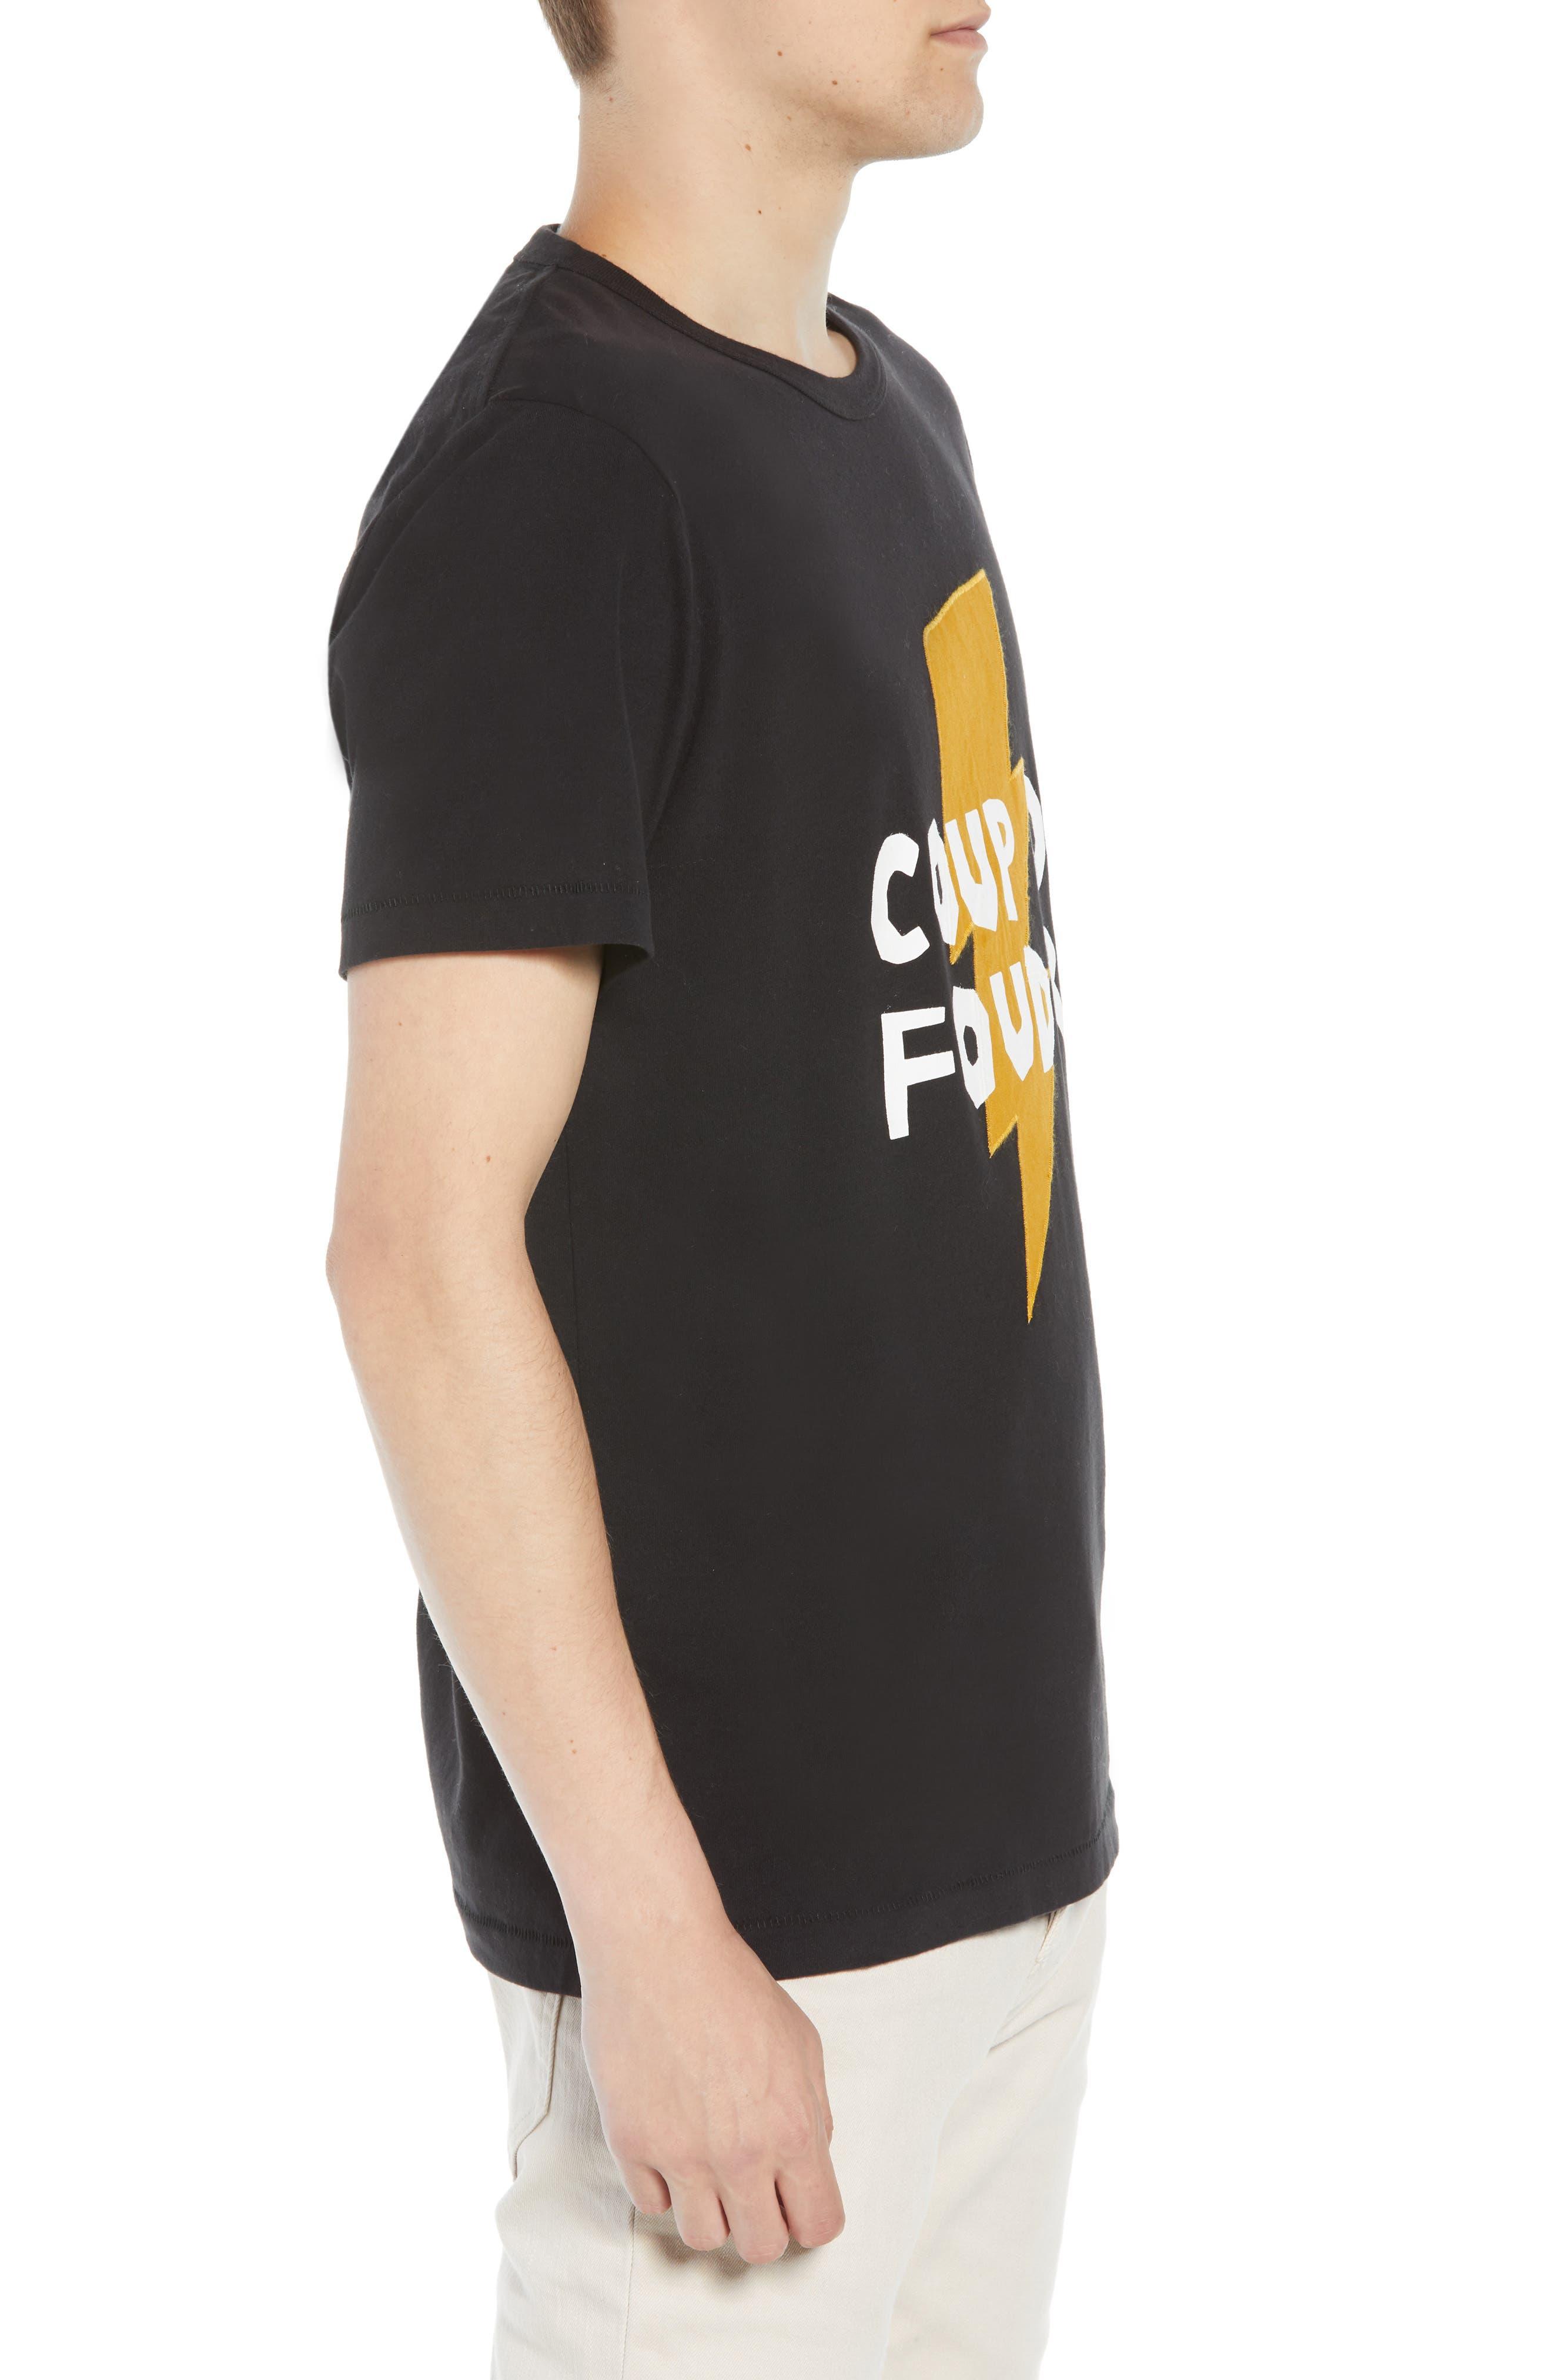 Love Struck T-Shirt,                             Alternate thumbnail 3, color,                             BLACK CALLUNA YELLOW WHITE